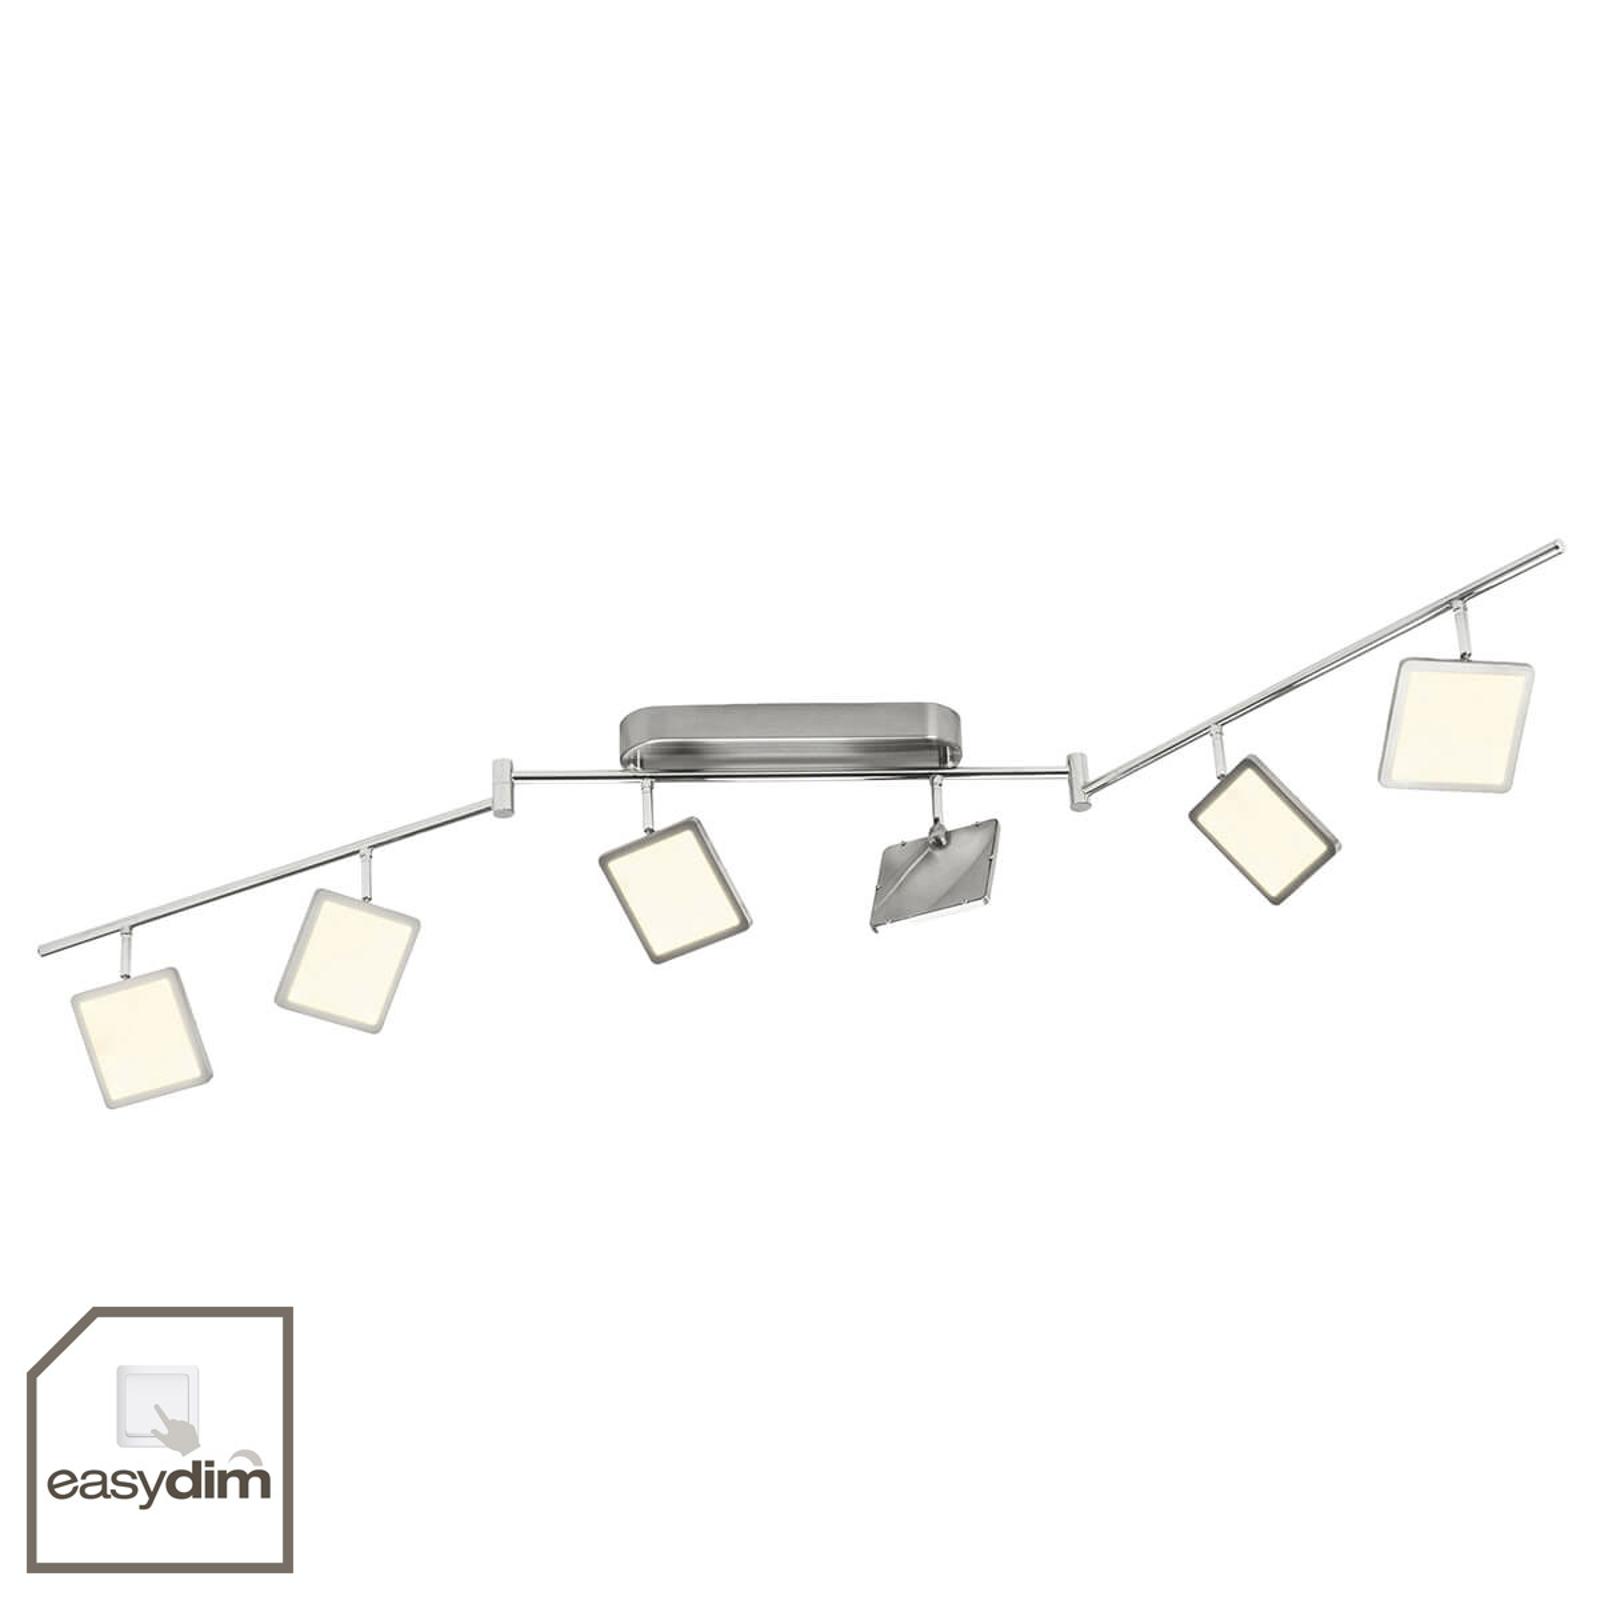 Lampa sufitowa LED Uranus Easydim, 6 ramion